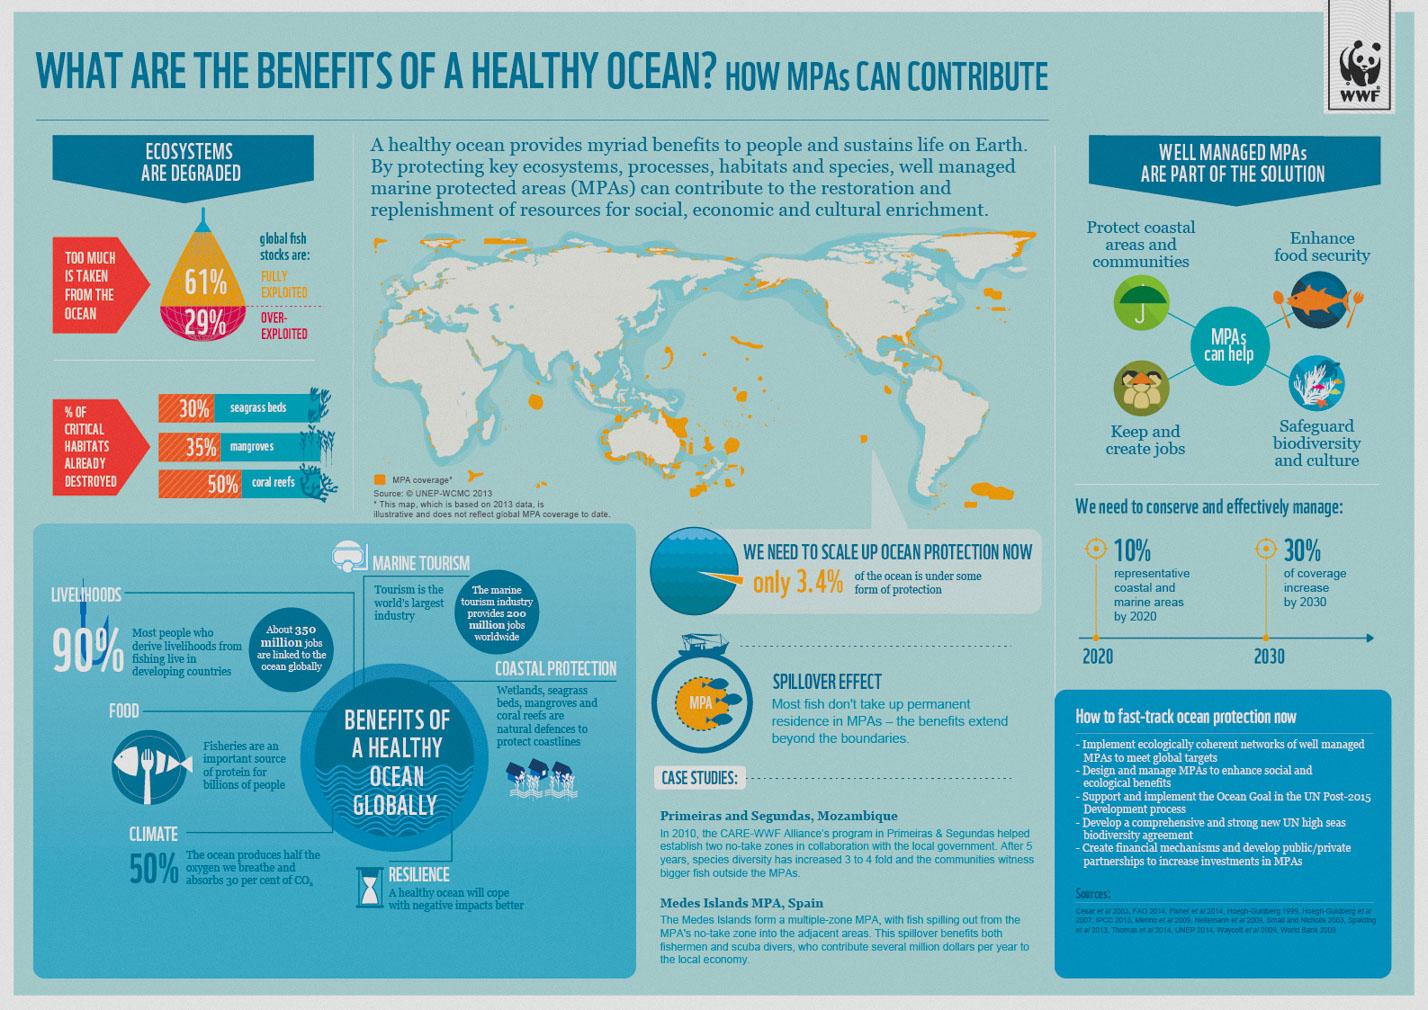 Benefits of a Healthy Ocean